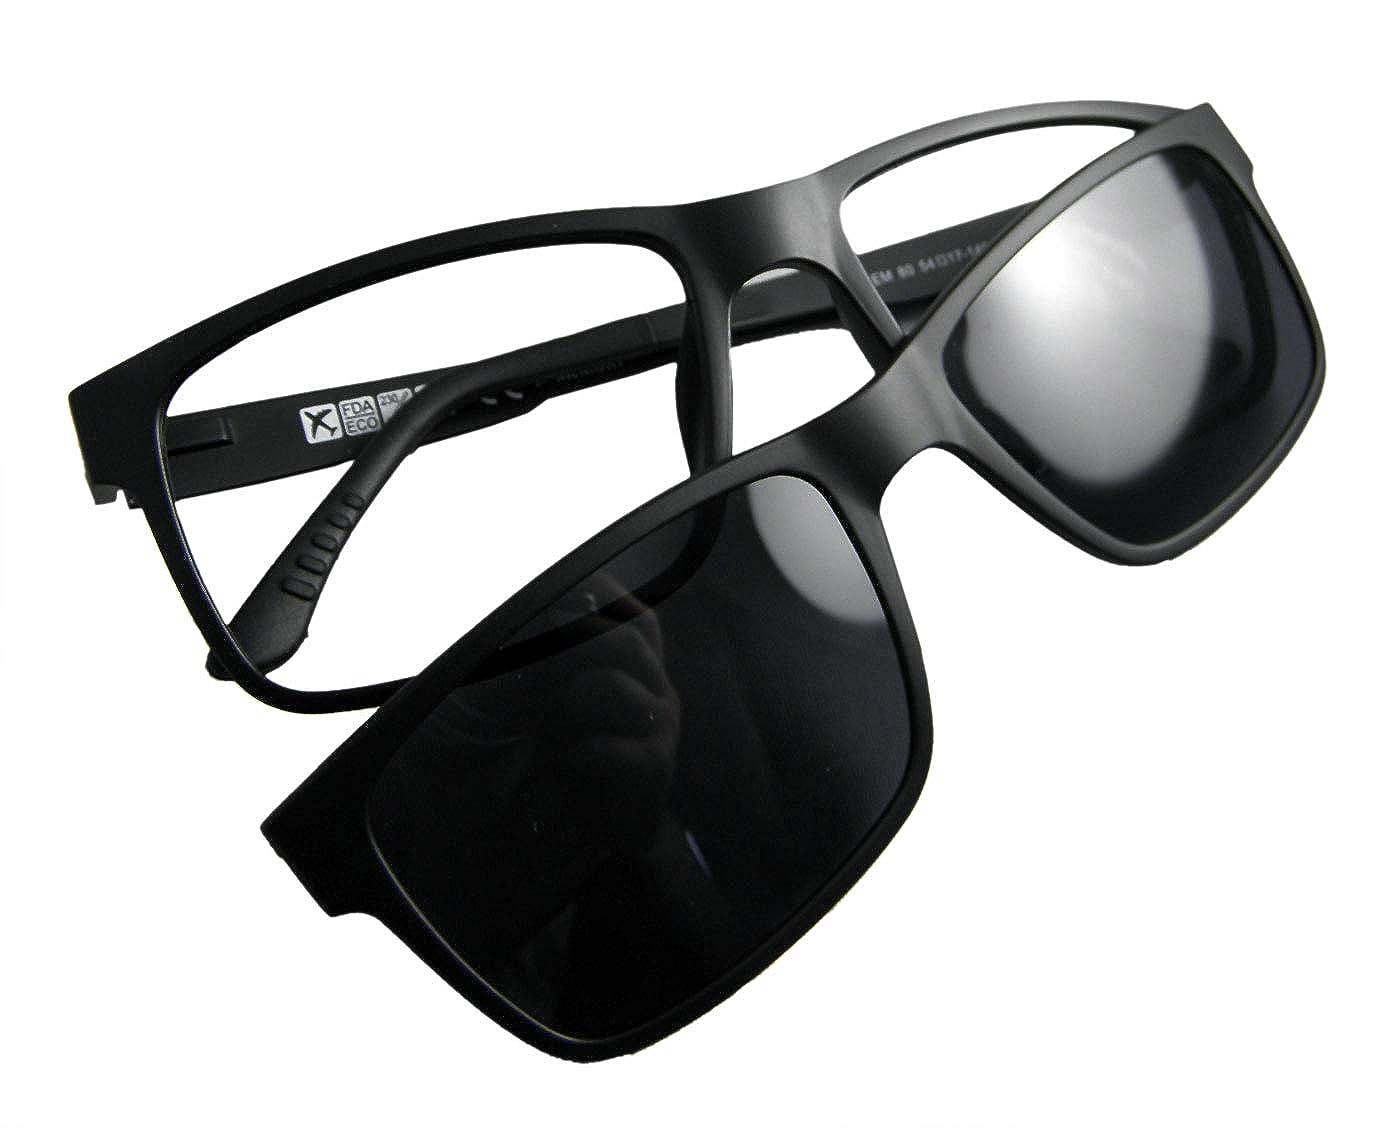 1d18337367 Amazon.com  Circleperson Men Eyeglass frame polarized clip on sunshade  magnetic glasses 54-17 (Black+print lens